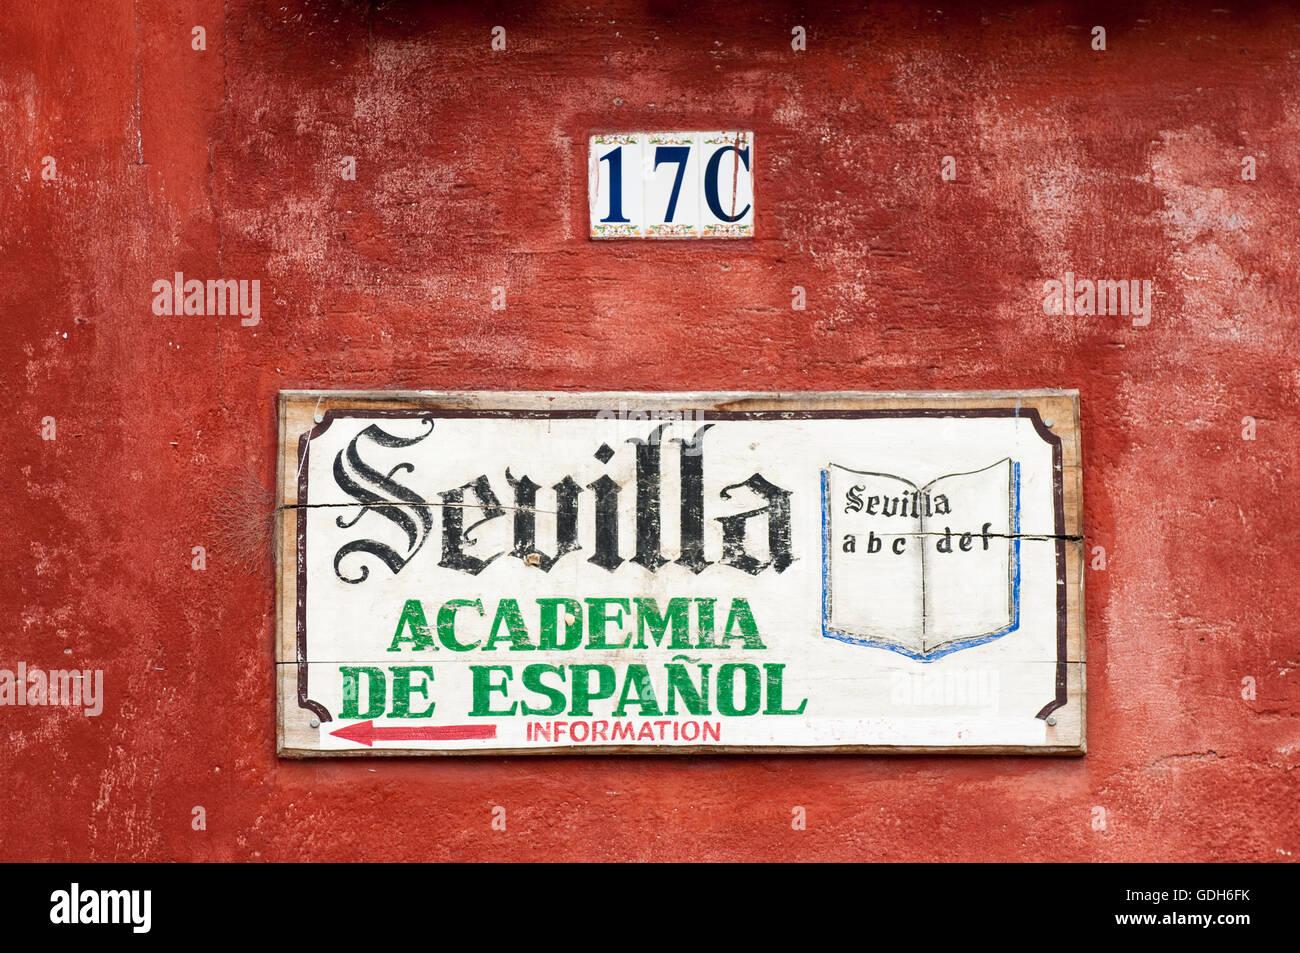 Sevilla Academia de Espanol, Spanish school sign, Antigua, Guatemala, Central America - Stock Image